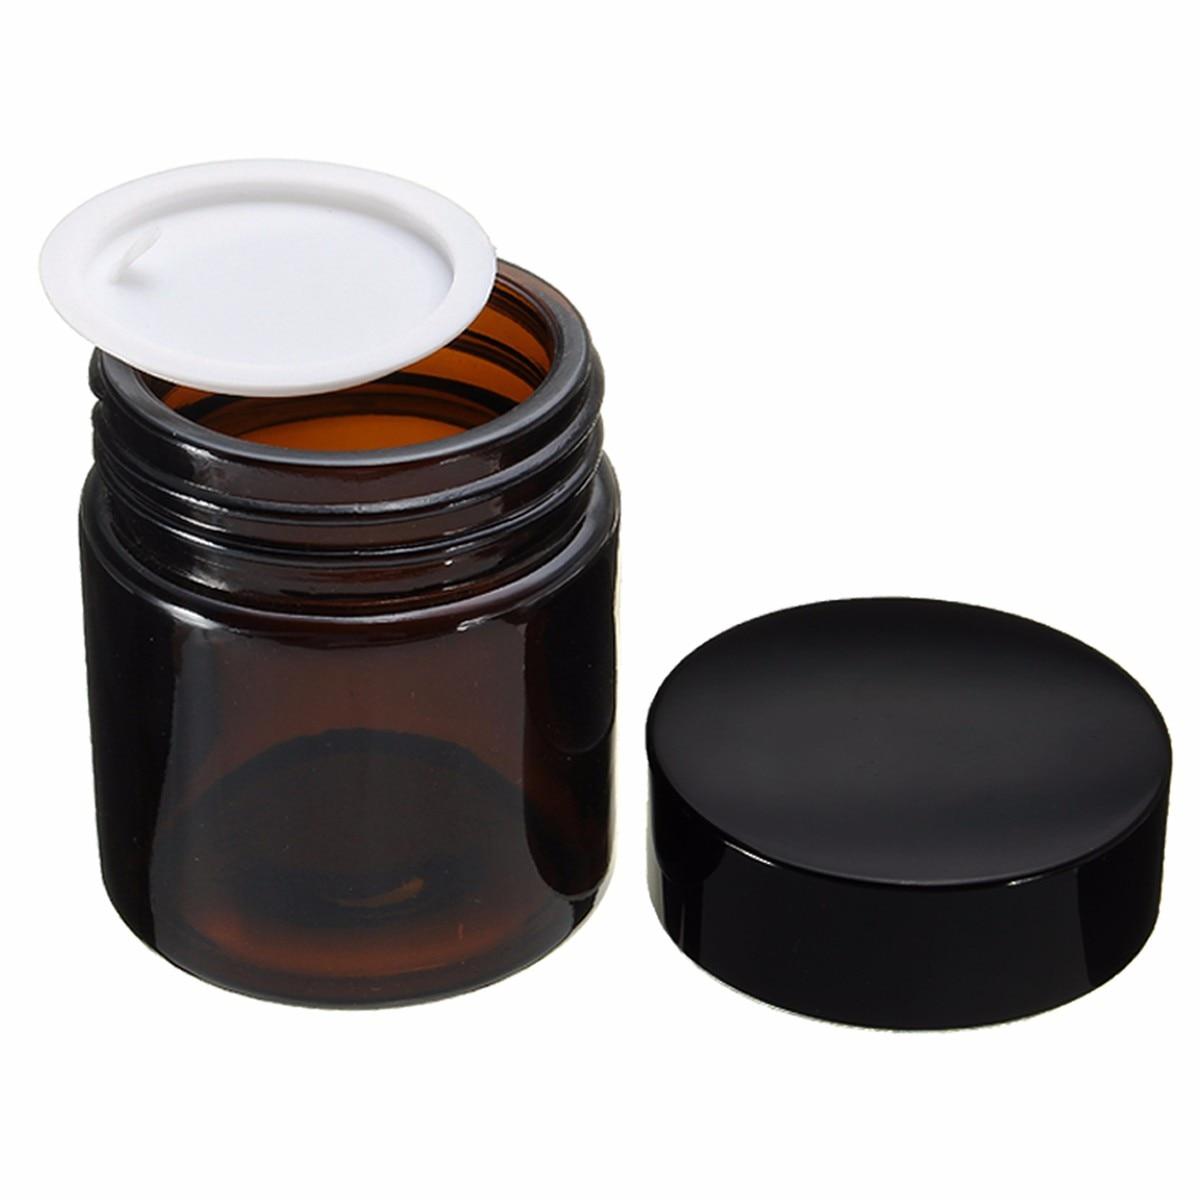 1pcs Brown Round Empty Amber Glass Jar Makeup Pot 120ml